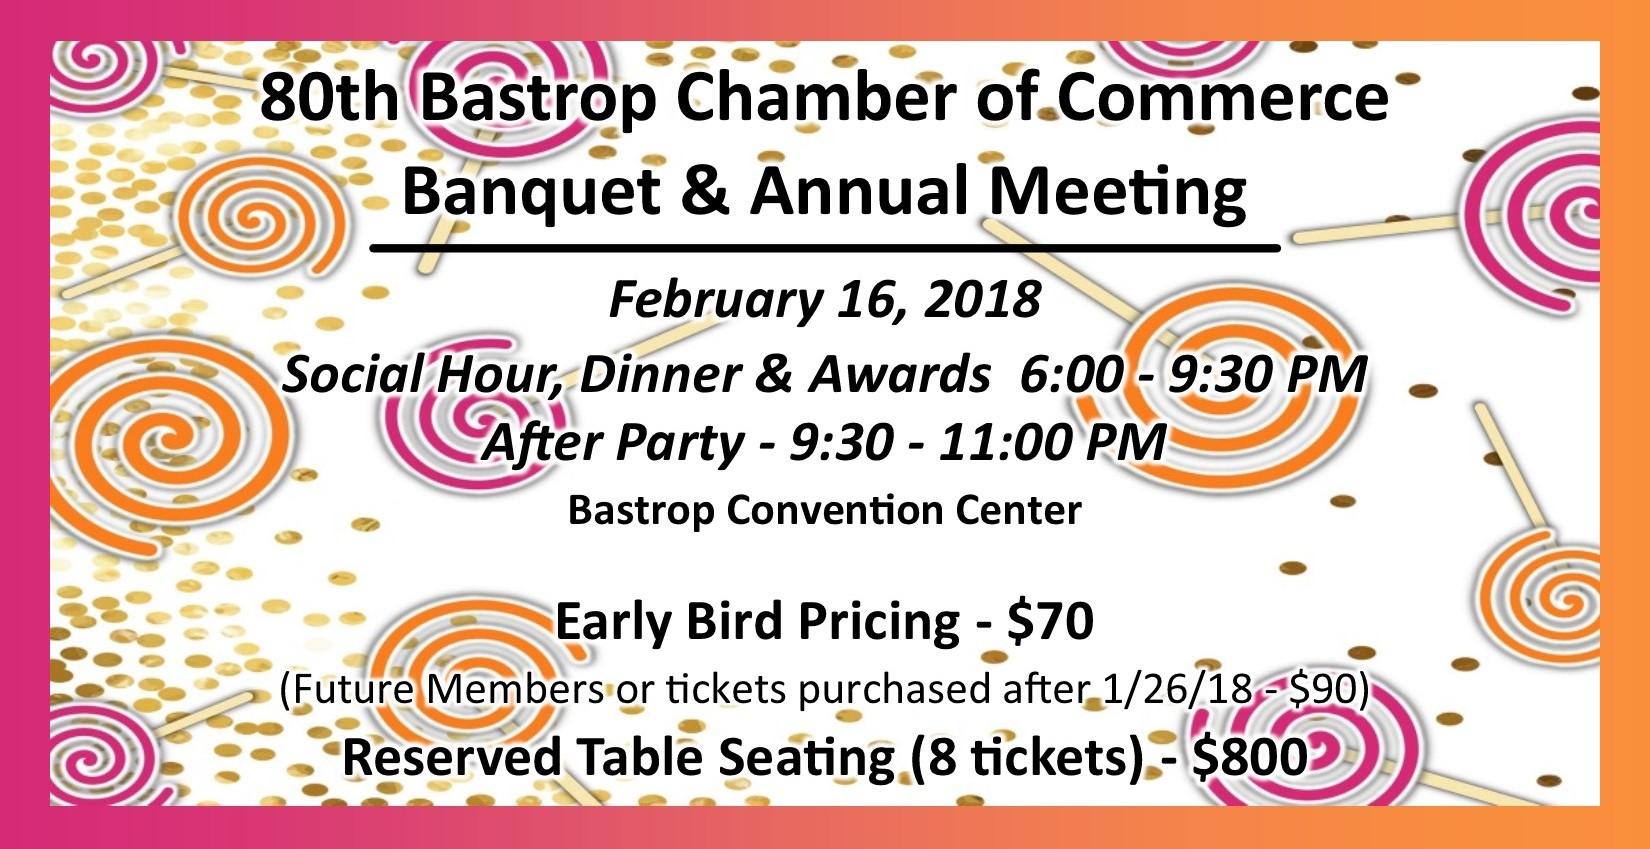 Bastrop Chamber Banquet February 16, 2018